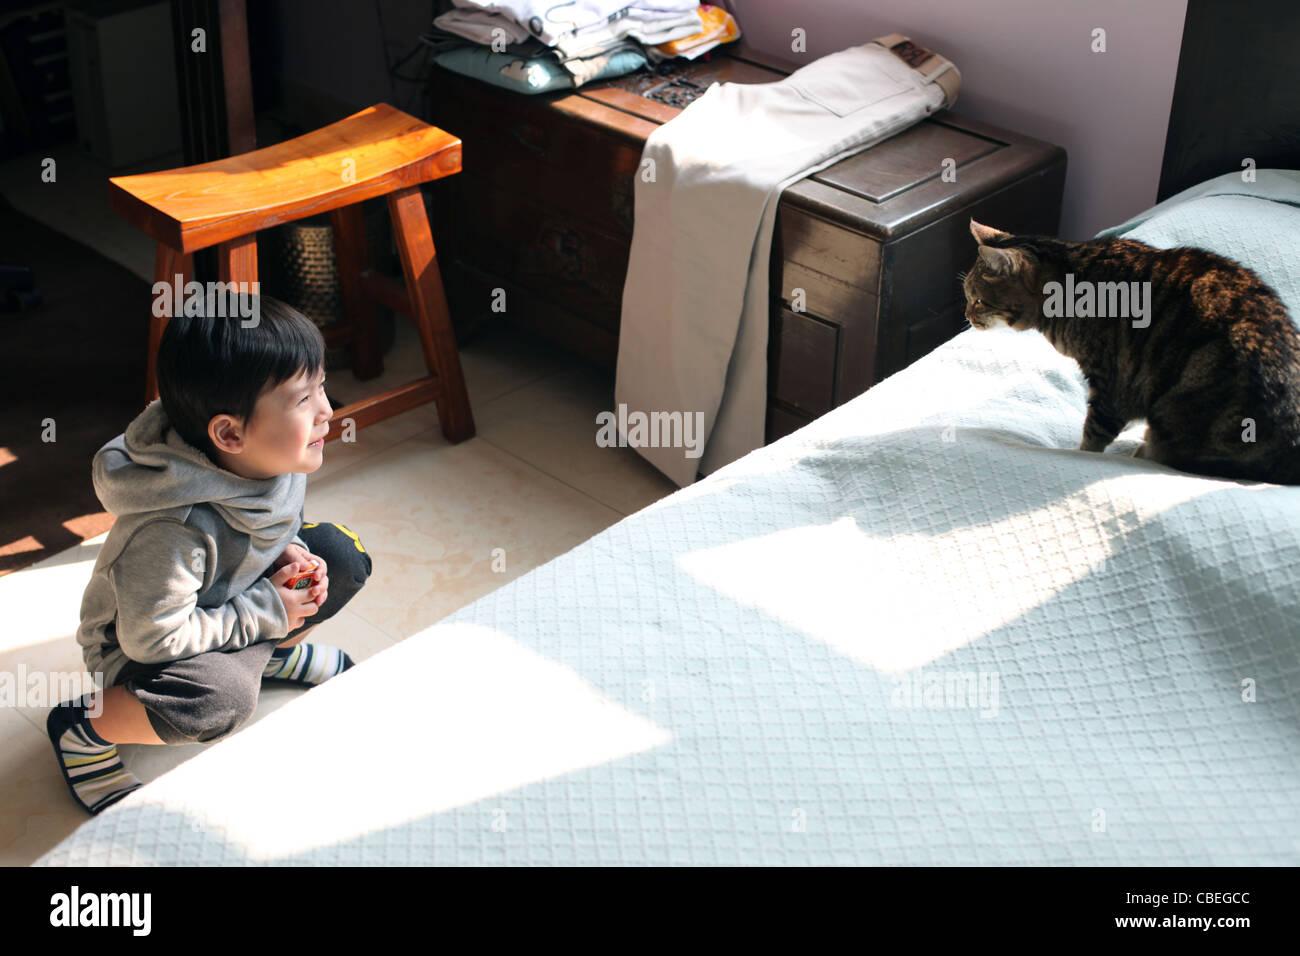 Kid Looking Under Bed